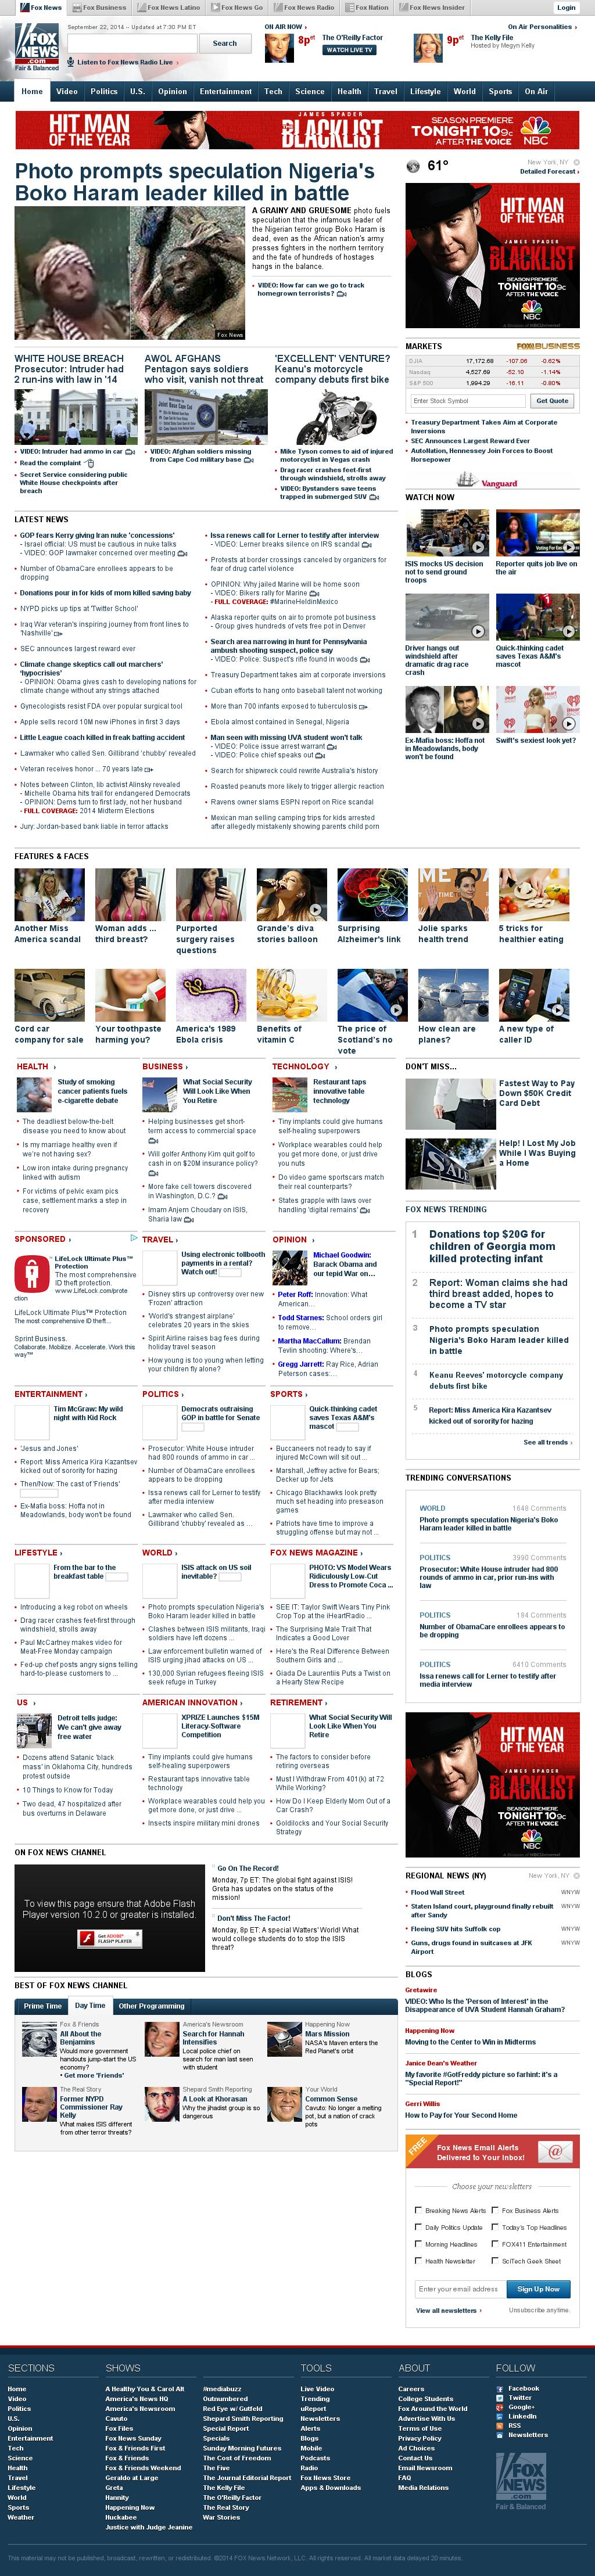 Fox News at Tuesday Sept. 23, 2014, 1:07 a.m. UTC